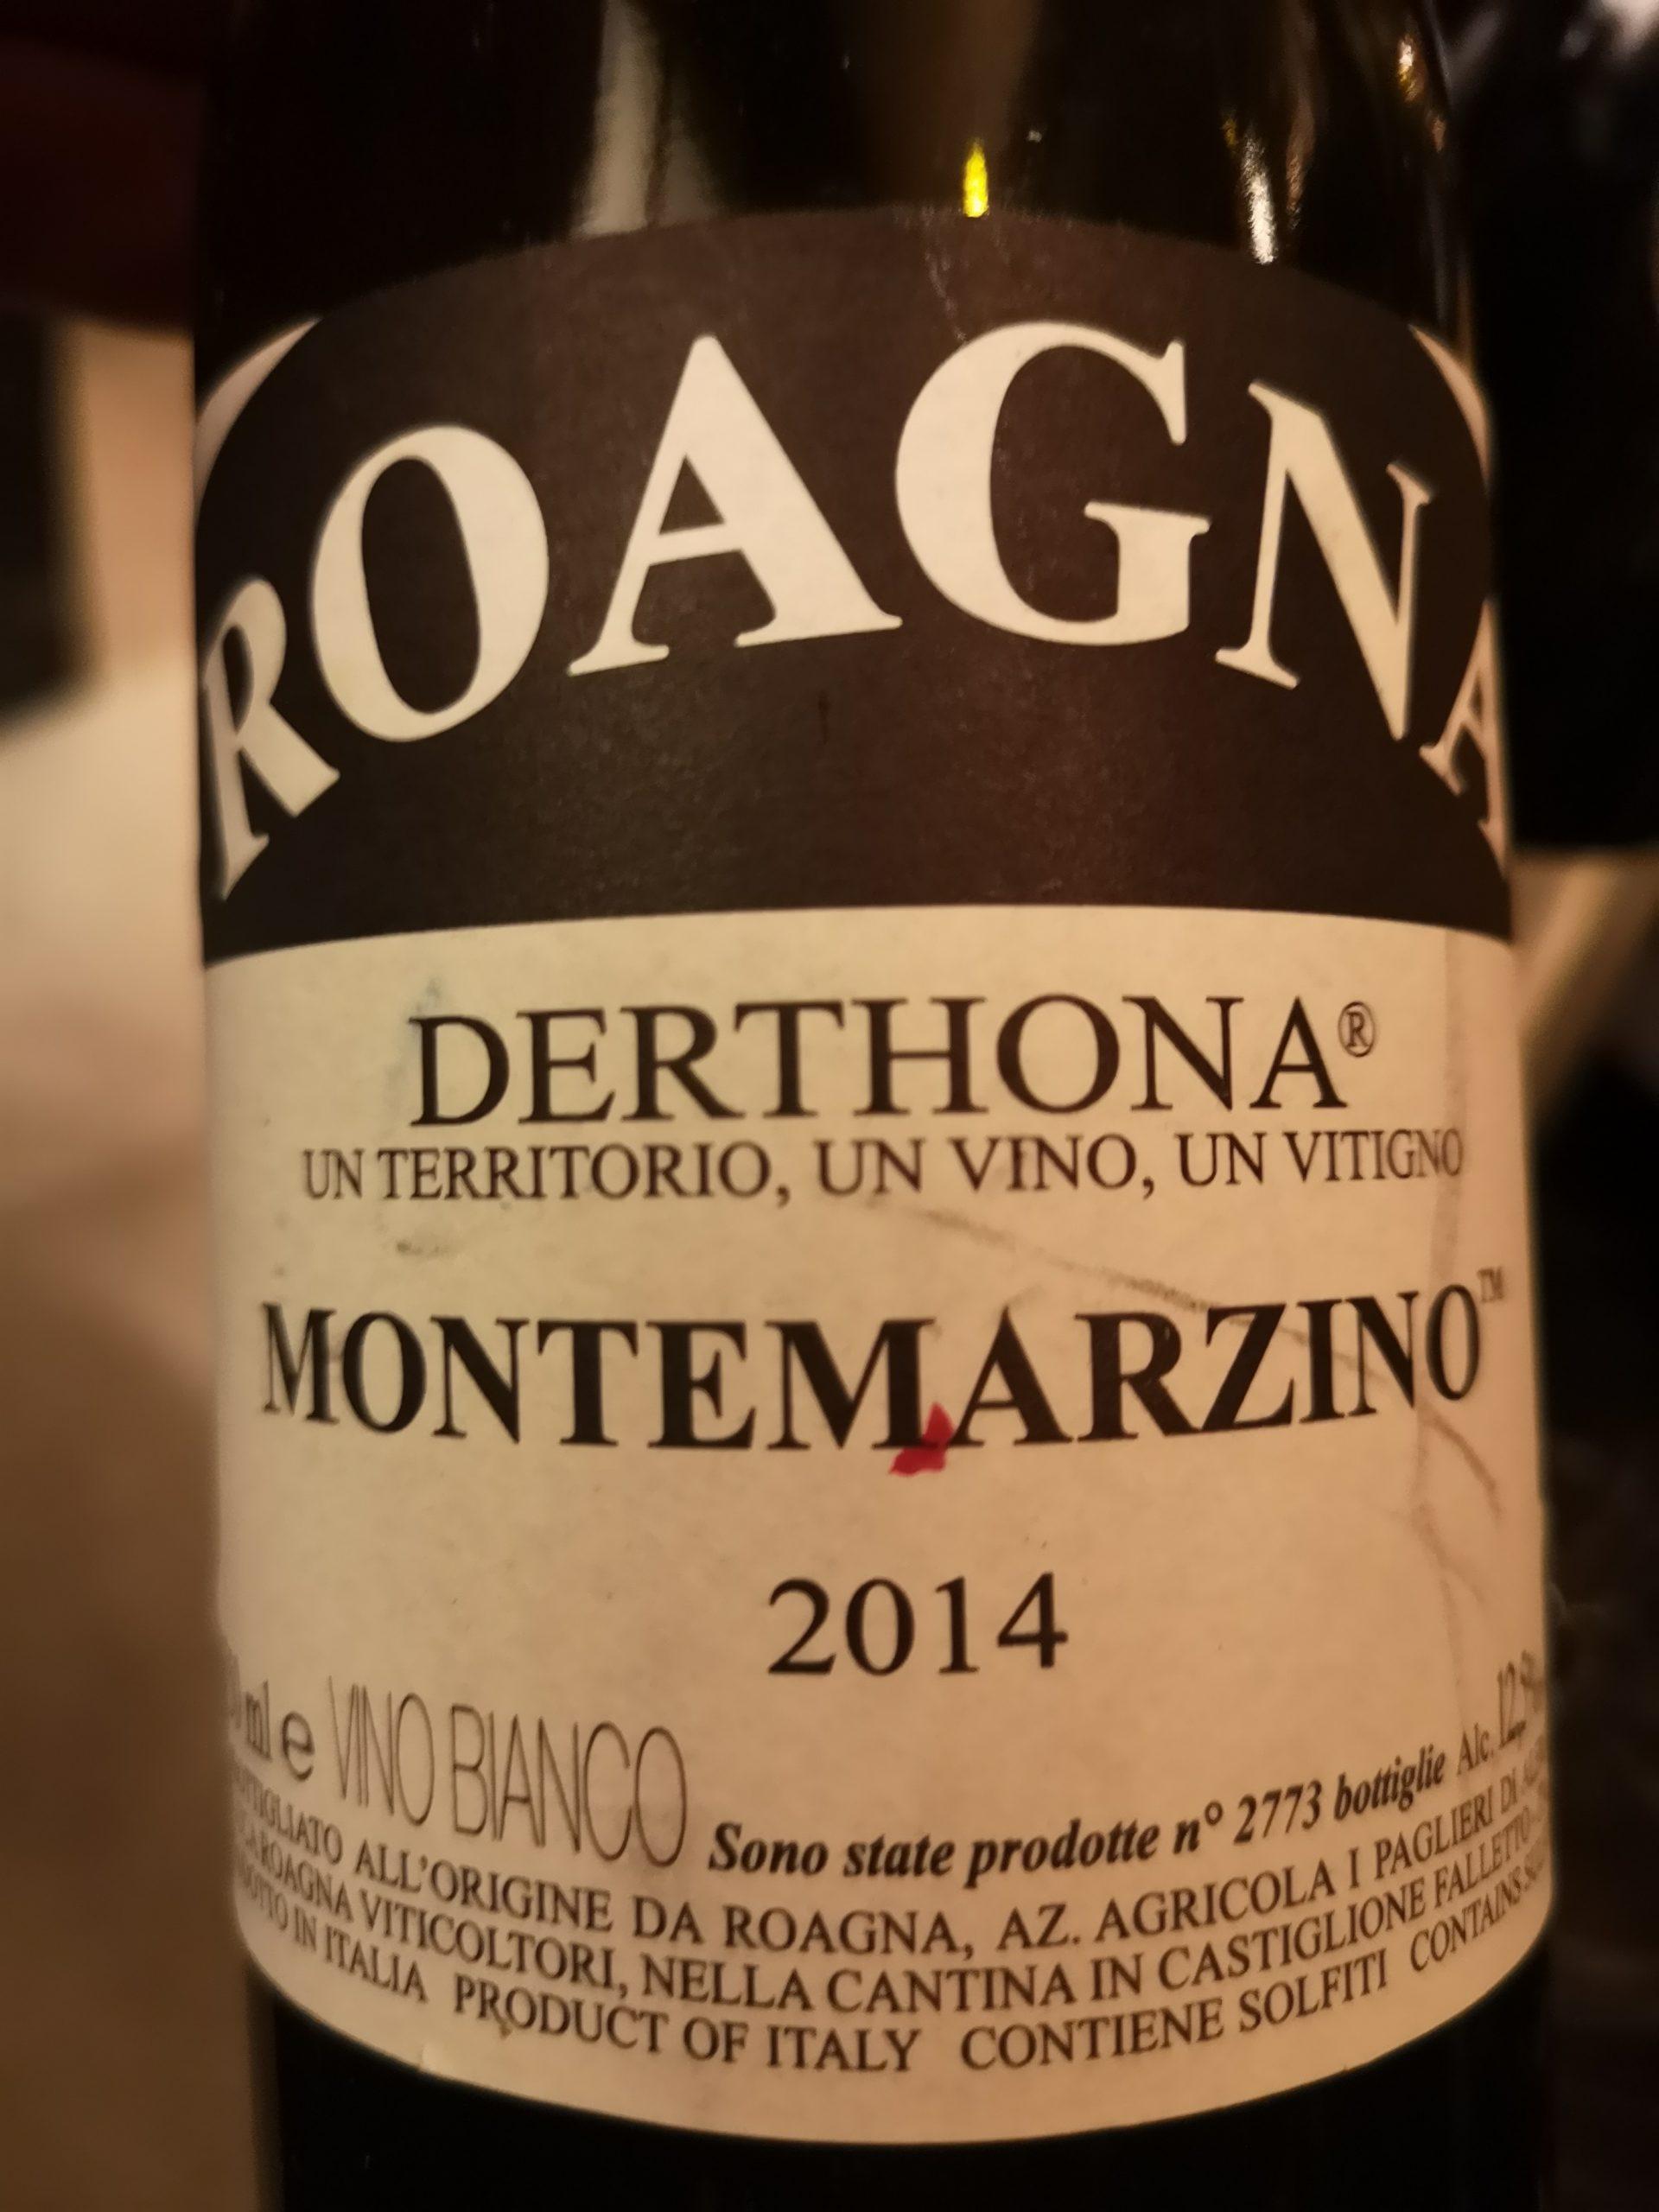 2014 Chardonnay Derthona Montemarzino | Roagna